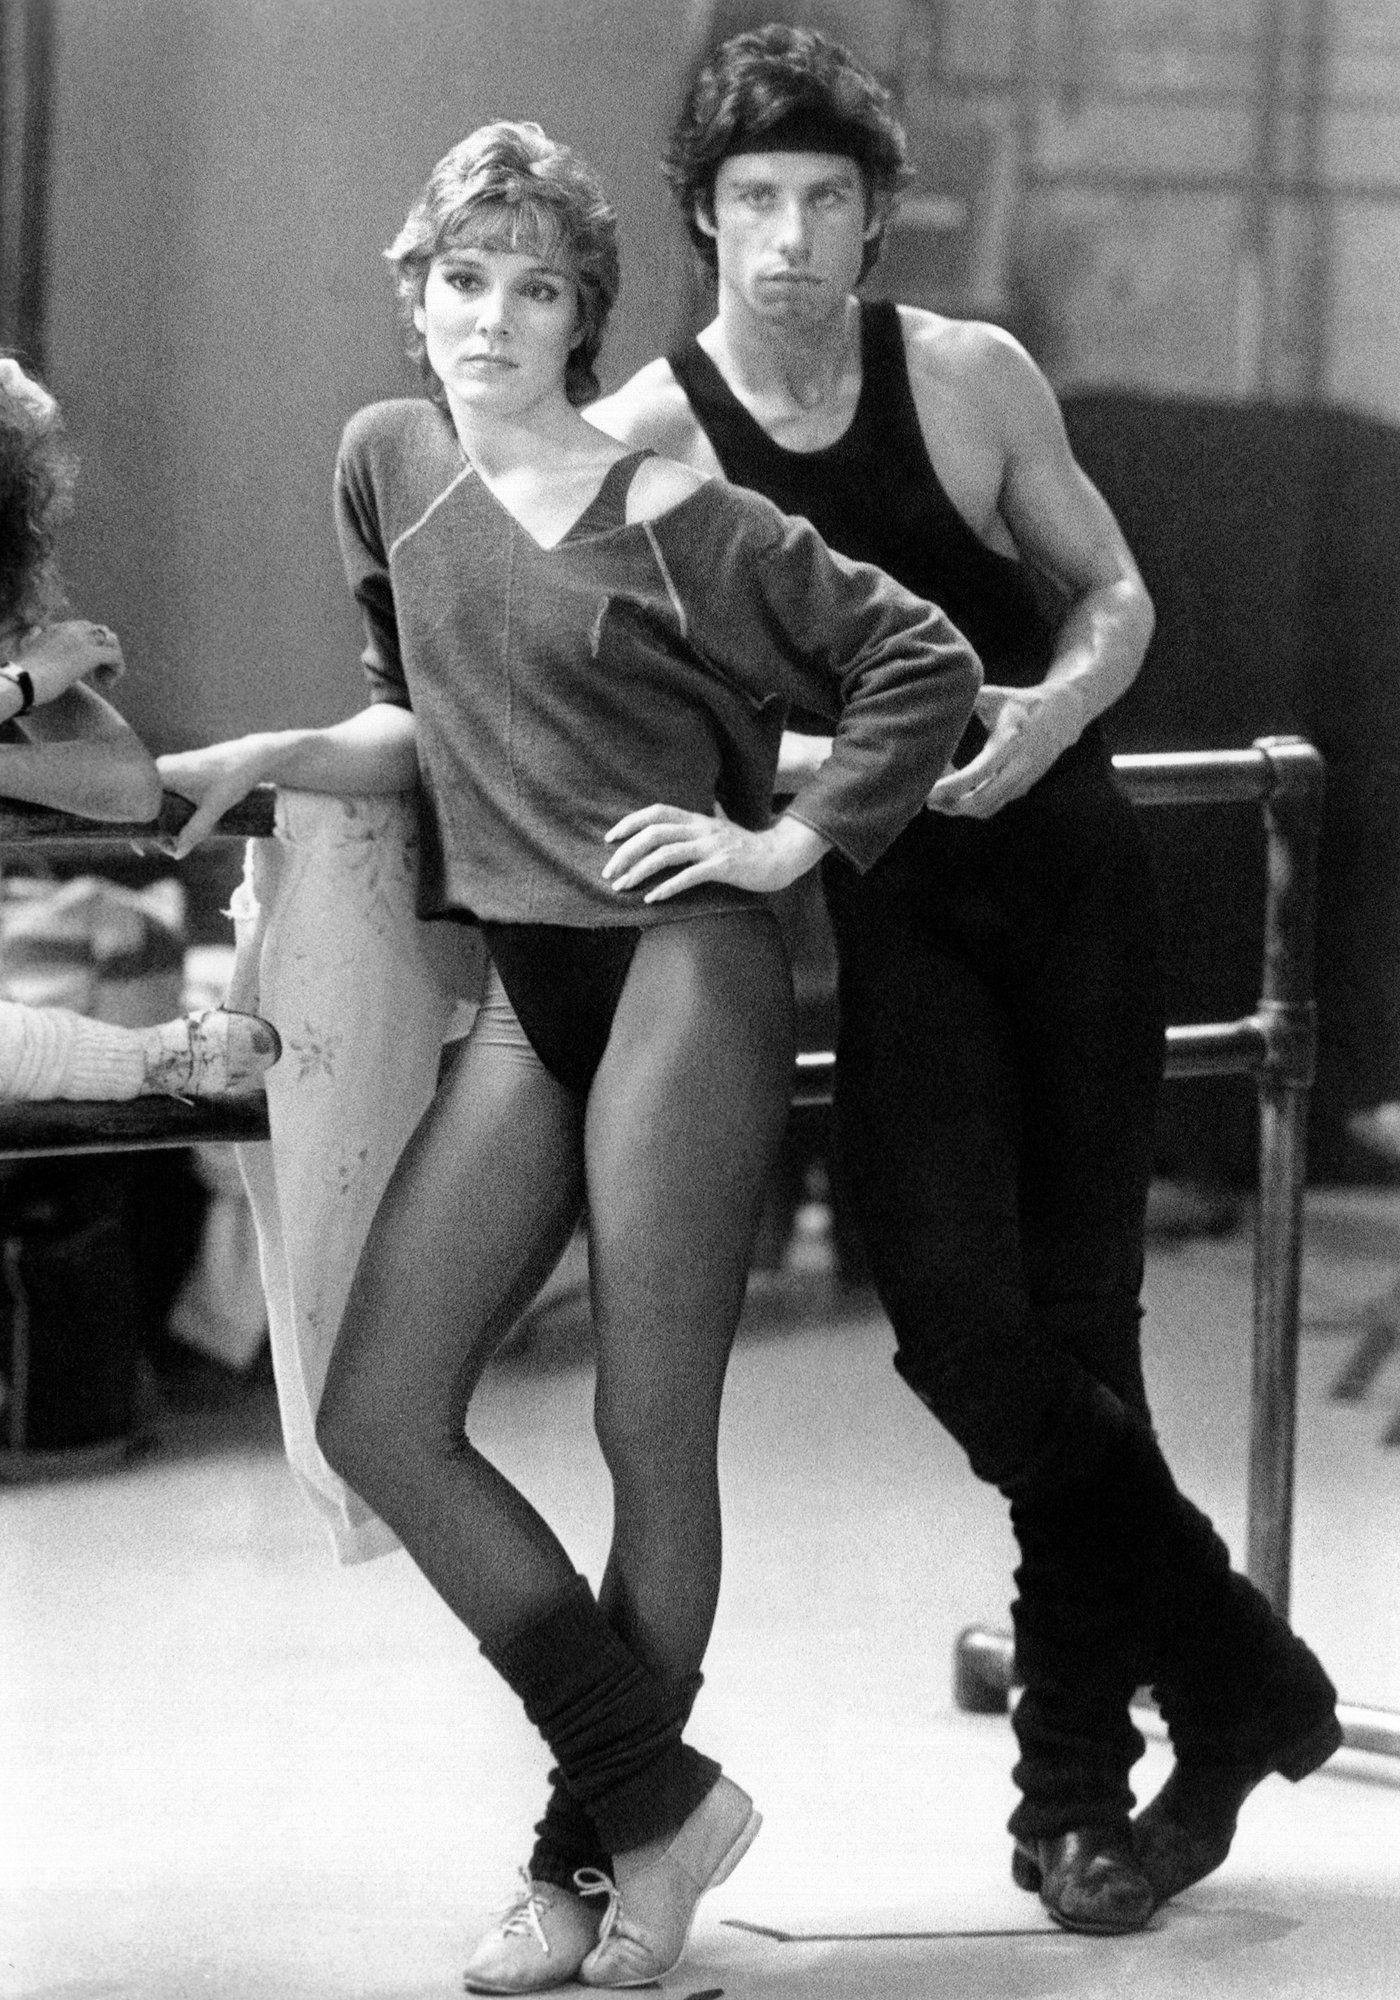 Cynthia You Re A Really Cool Dancer : cynthia, really, dancer, Cynthia, Rhodes